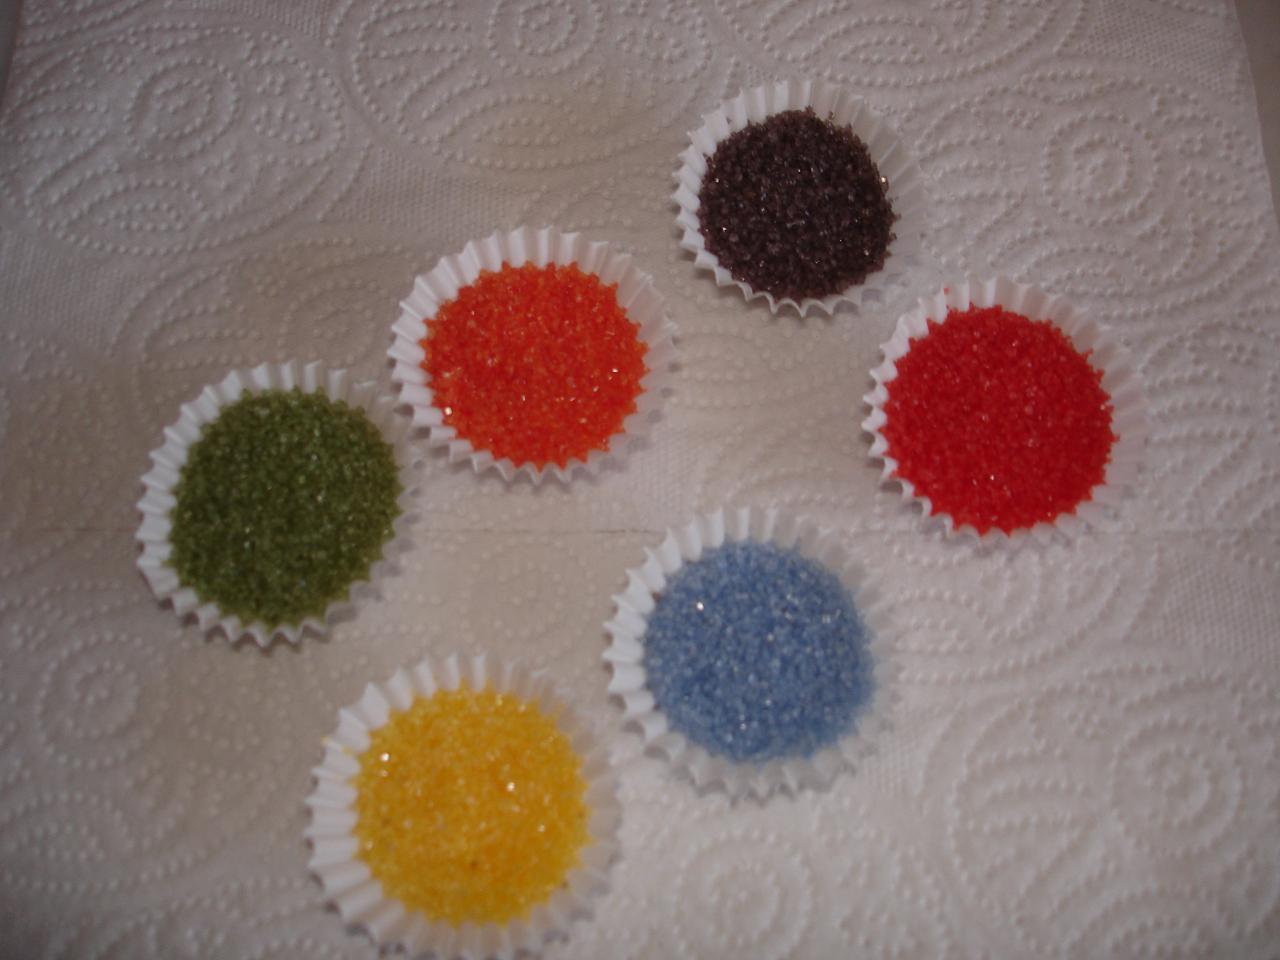 Casminella Renkli Toz Seker Nasil Yapilir How To Make Colored Sugar